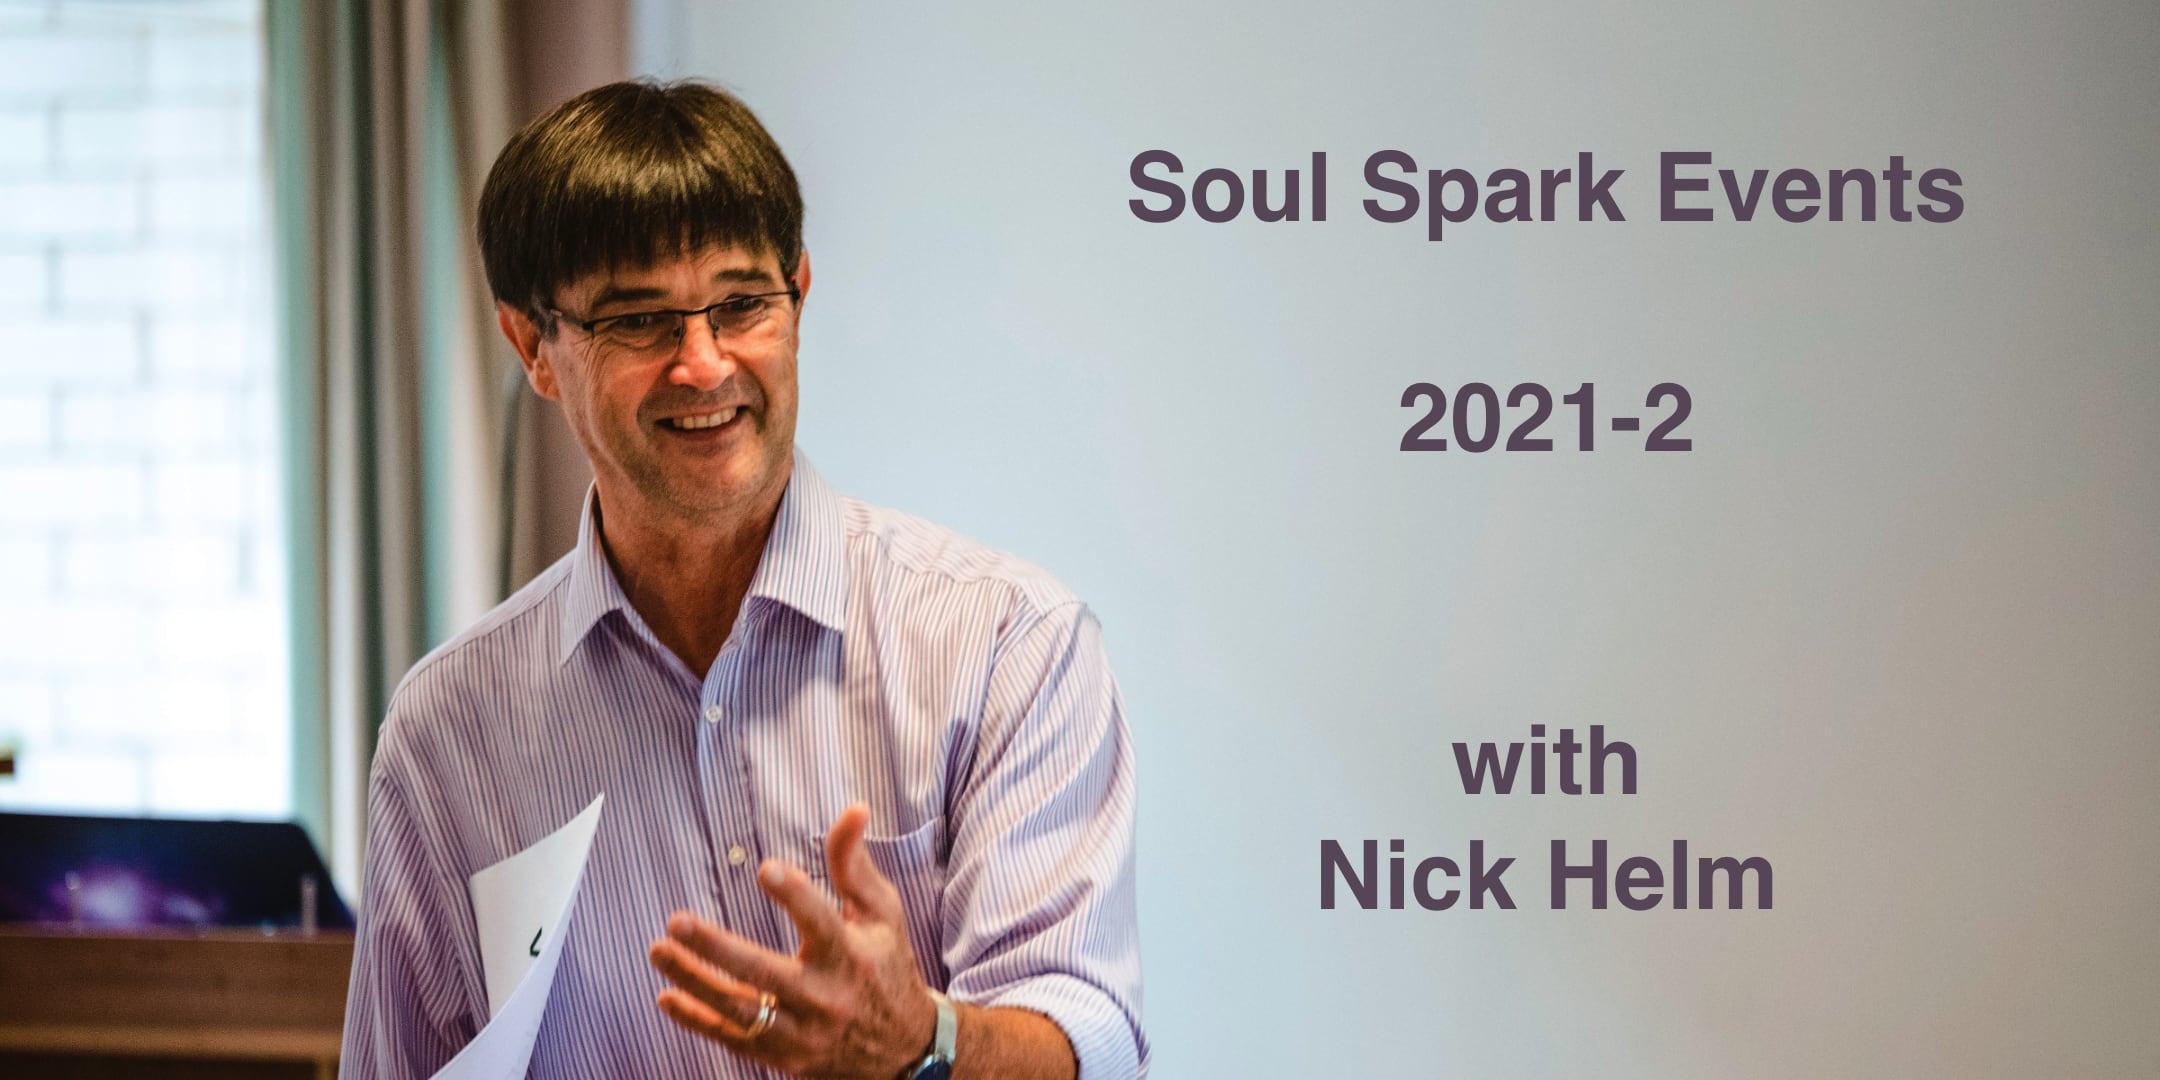 Soul Spark Events for Spiritual Directors 2021-2